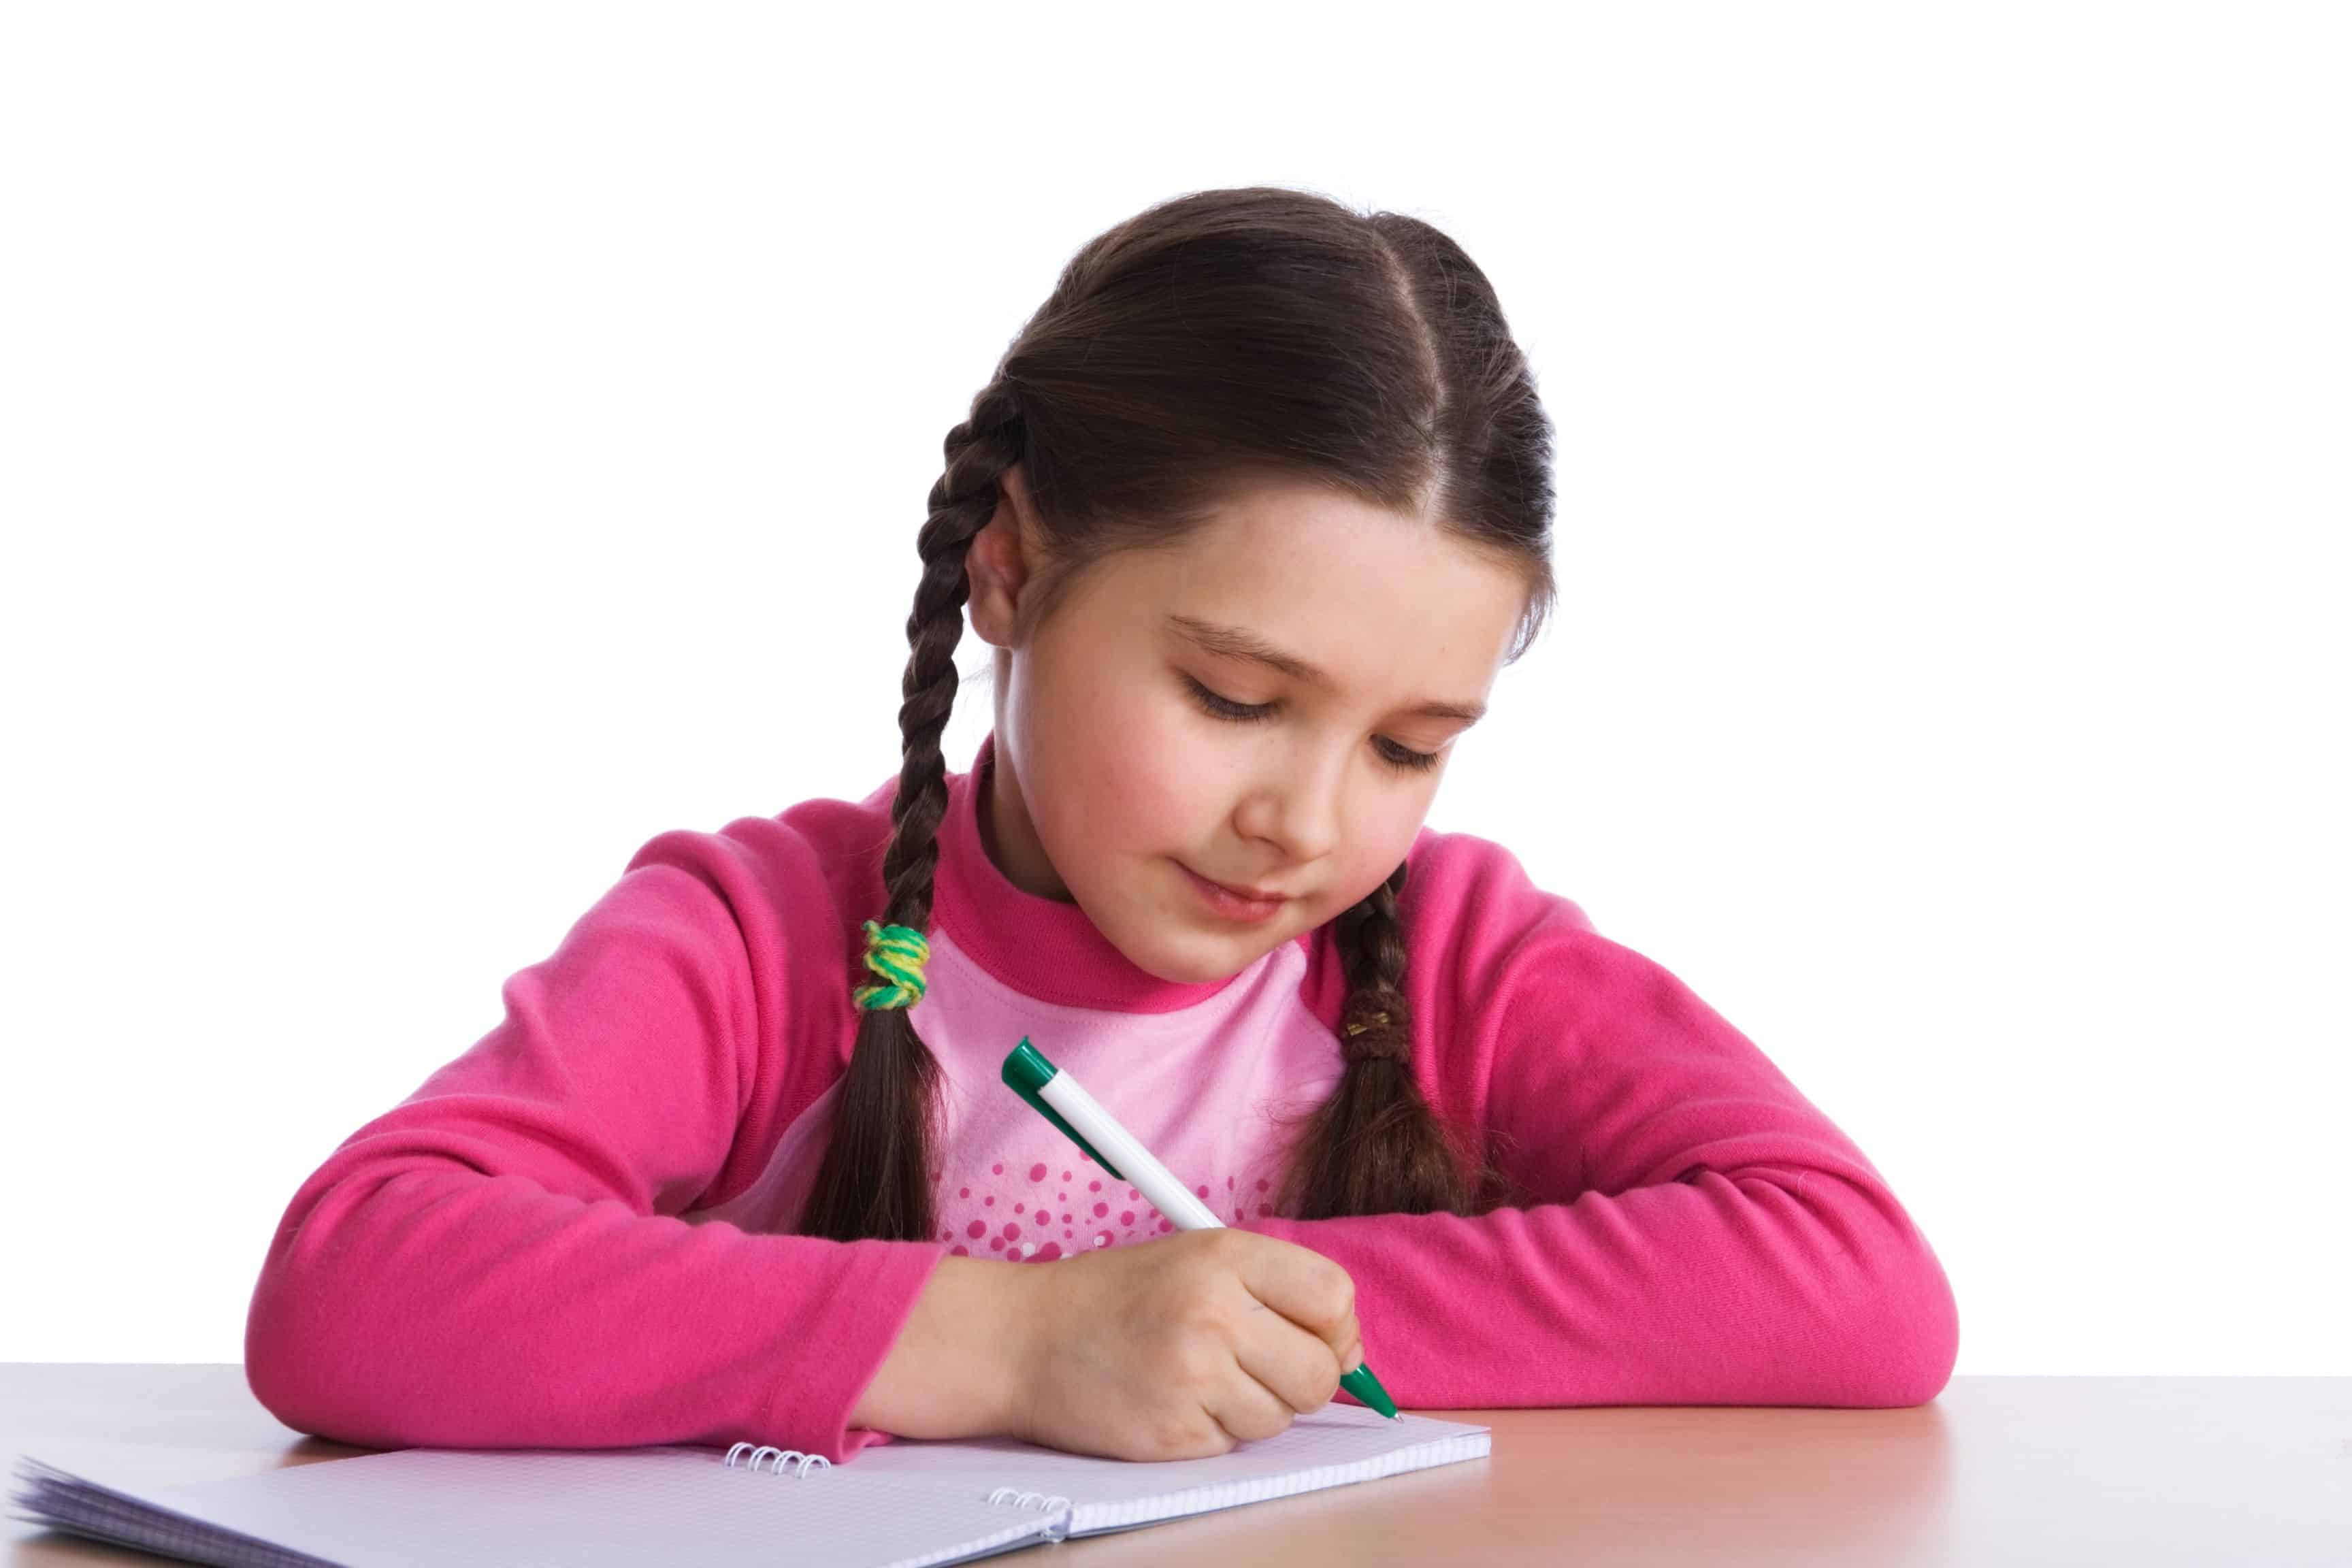 Homework Writer Online - Secure A+ Grade by Top Homework Experts